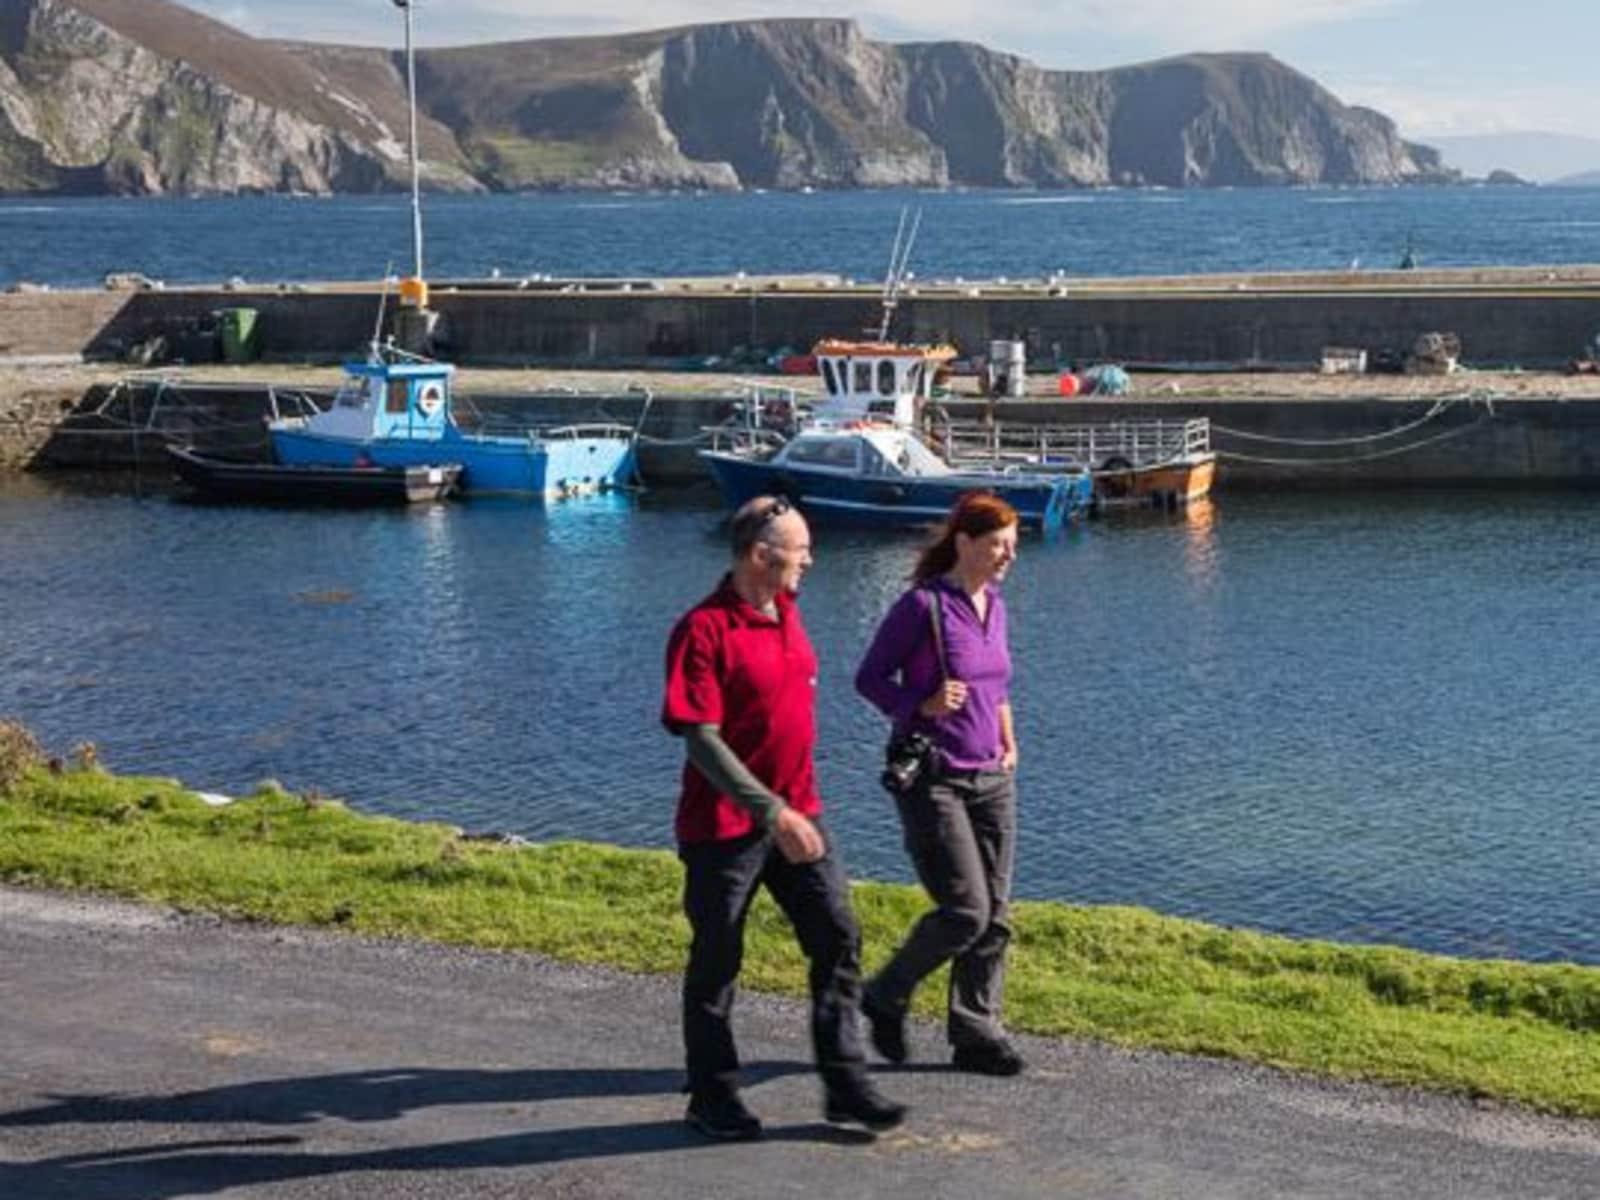 Valli & Gerry from Sligo, Ireland